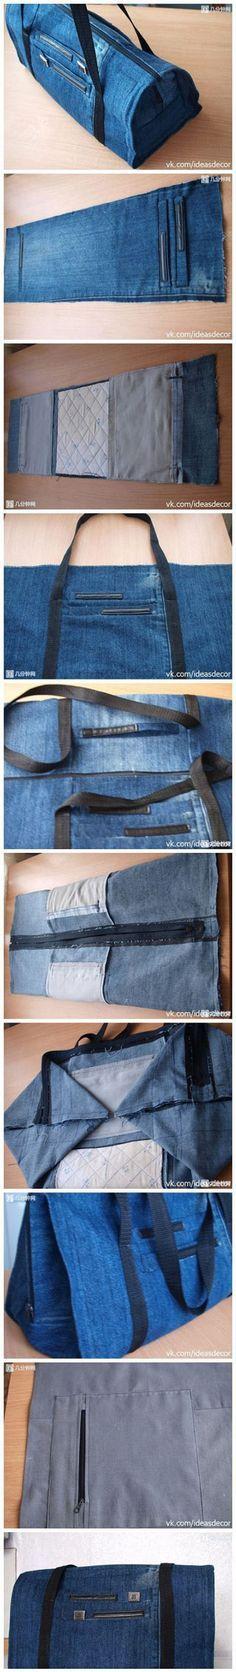 Diy Jean Bag | DIY & Crafts